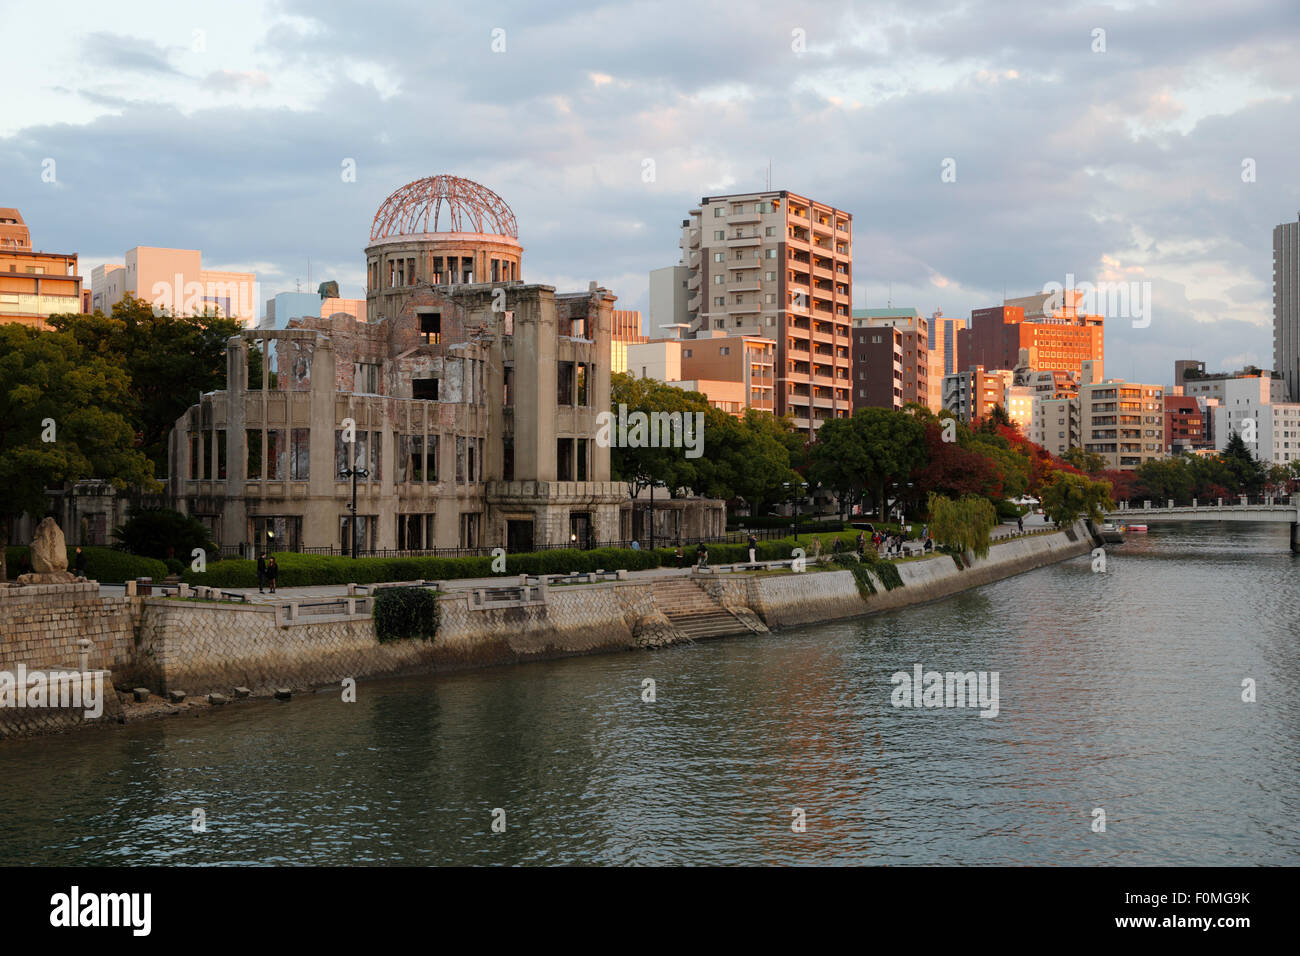 Atomic Bomb Dome on the Motoyasu-gawa River, Hiroshima, Western Honshu, Japan, Asia Stock Photo